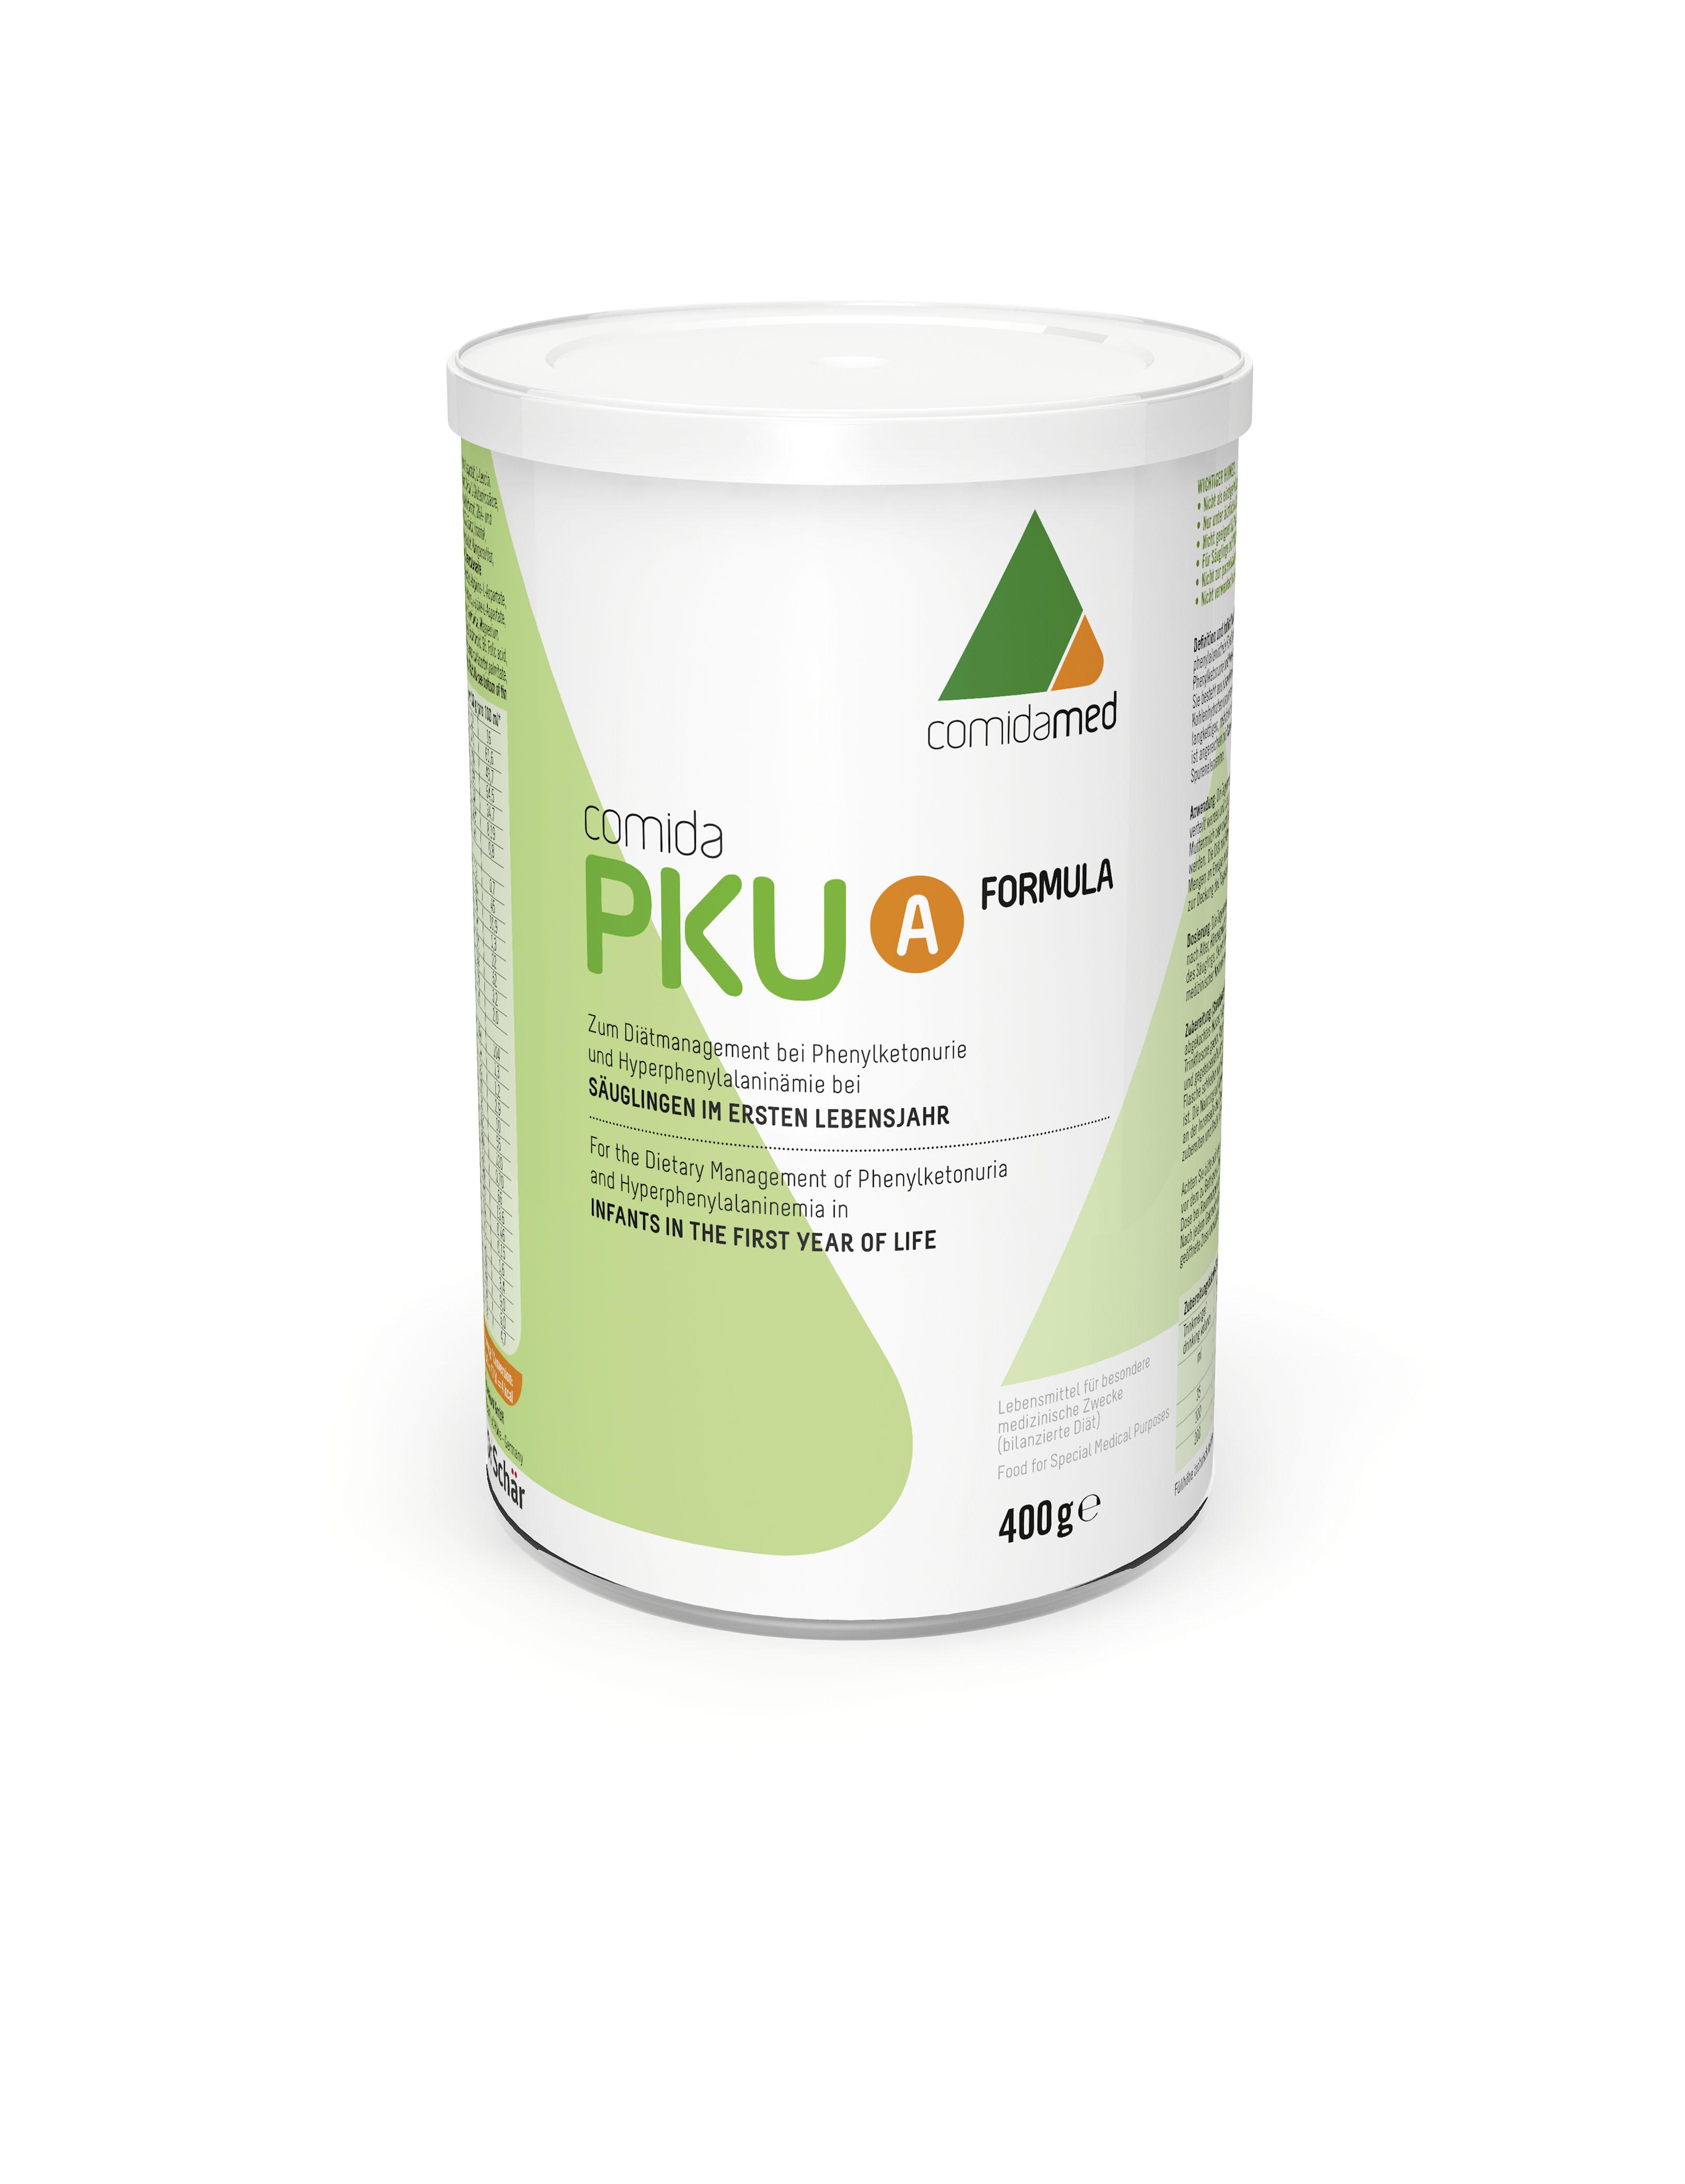 comida-PKU A FORMULA